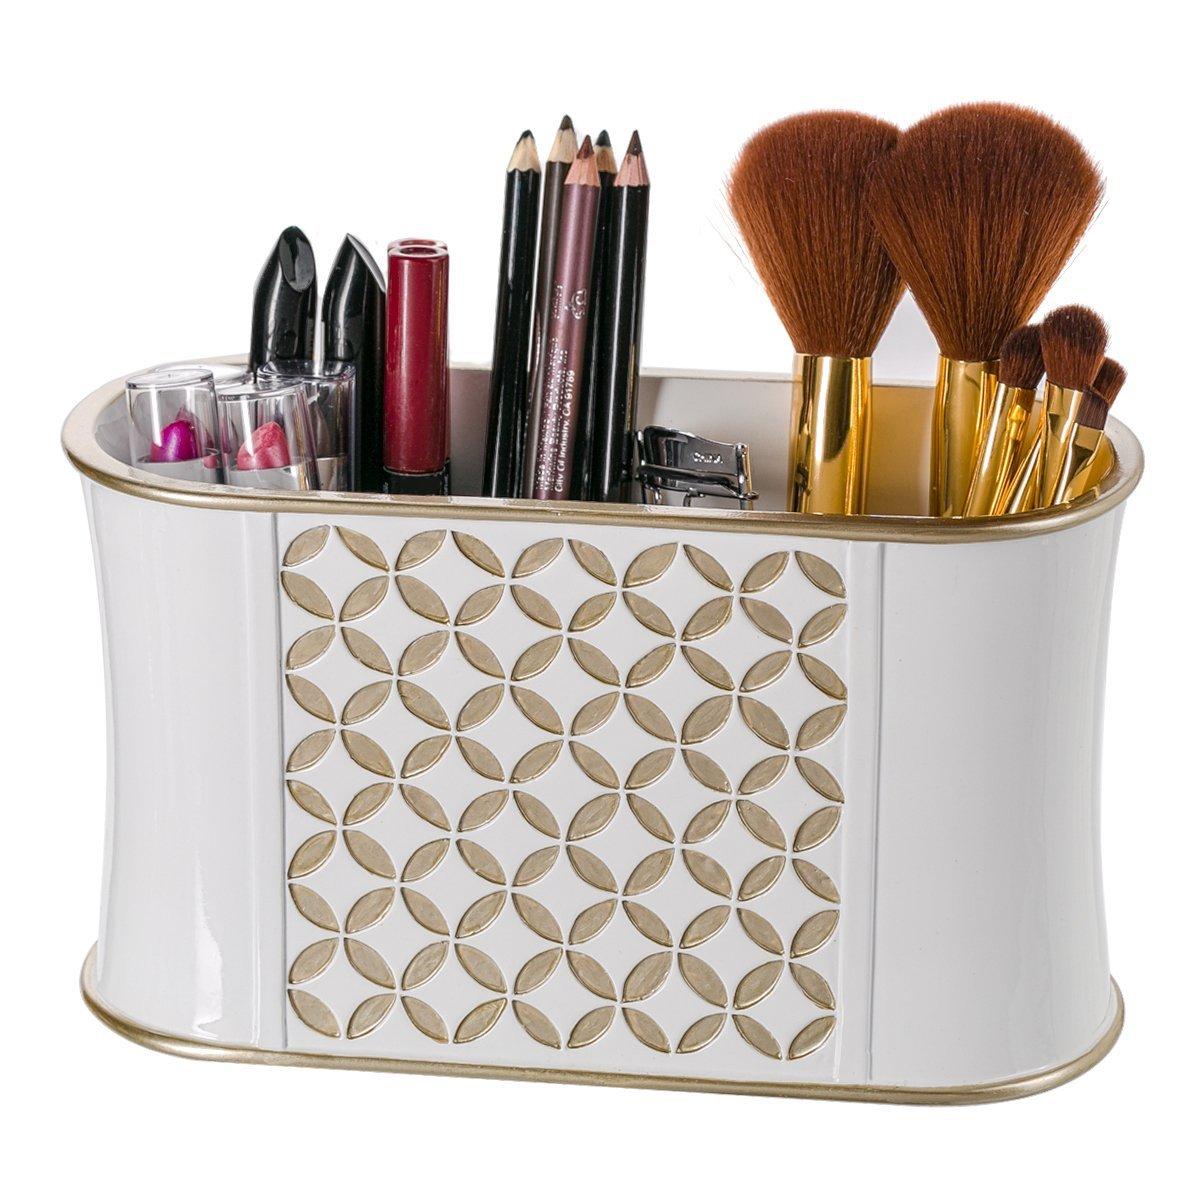 Makeup Brush Holder, Diamond Lattice Bathroom Organizer Countertop, Decorative Bathroom Counter/Vanity Organizer, 3 Slot Cosmetic Brushes Caddy/Hair Accessories Storage, Gift Packaged (White/Gold)